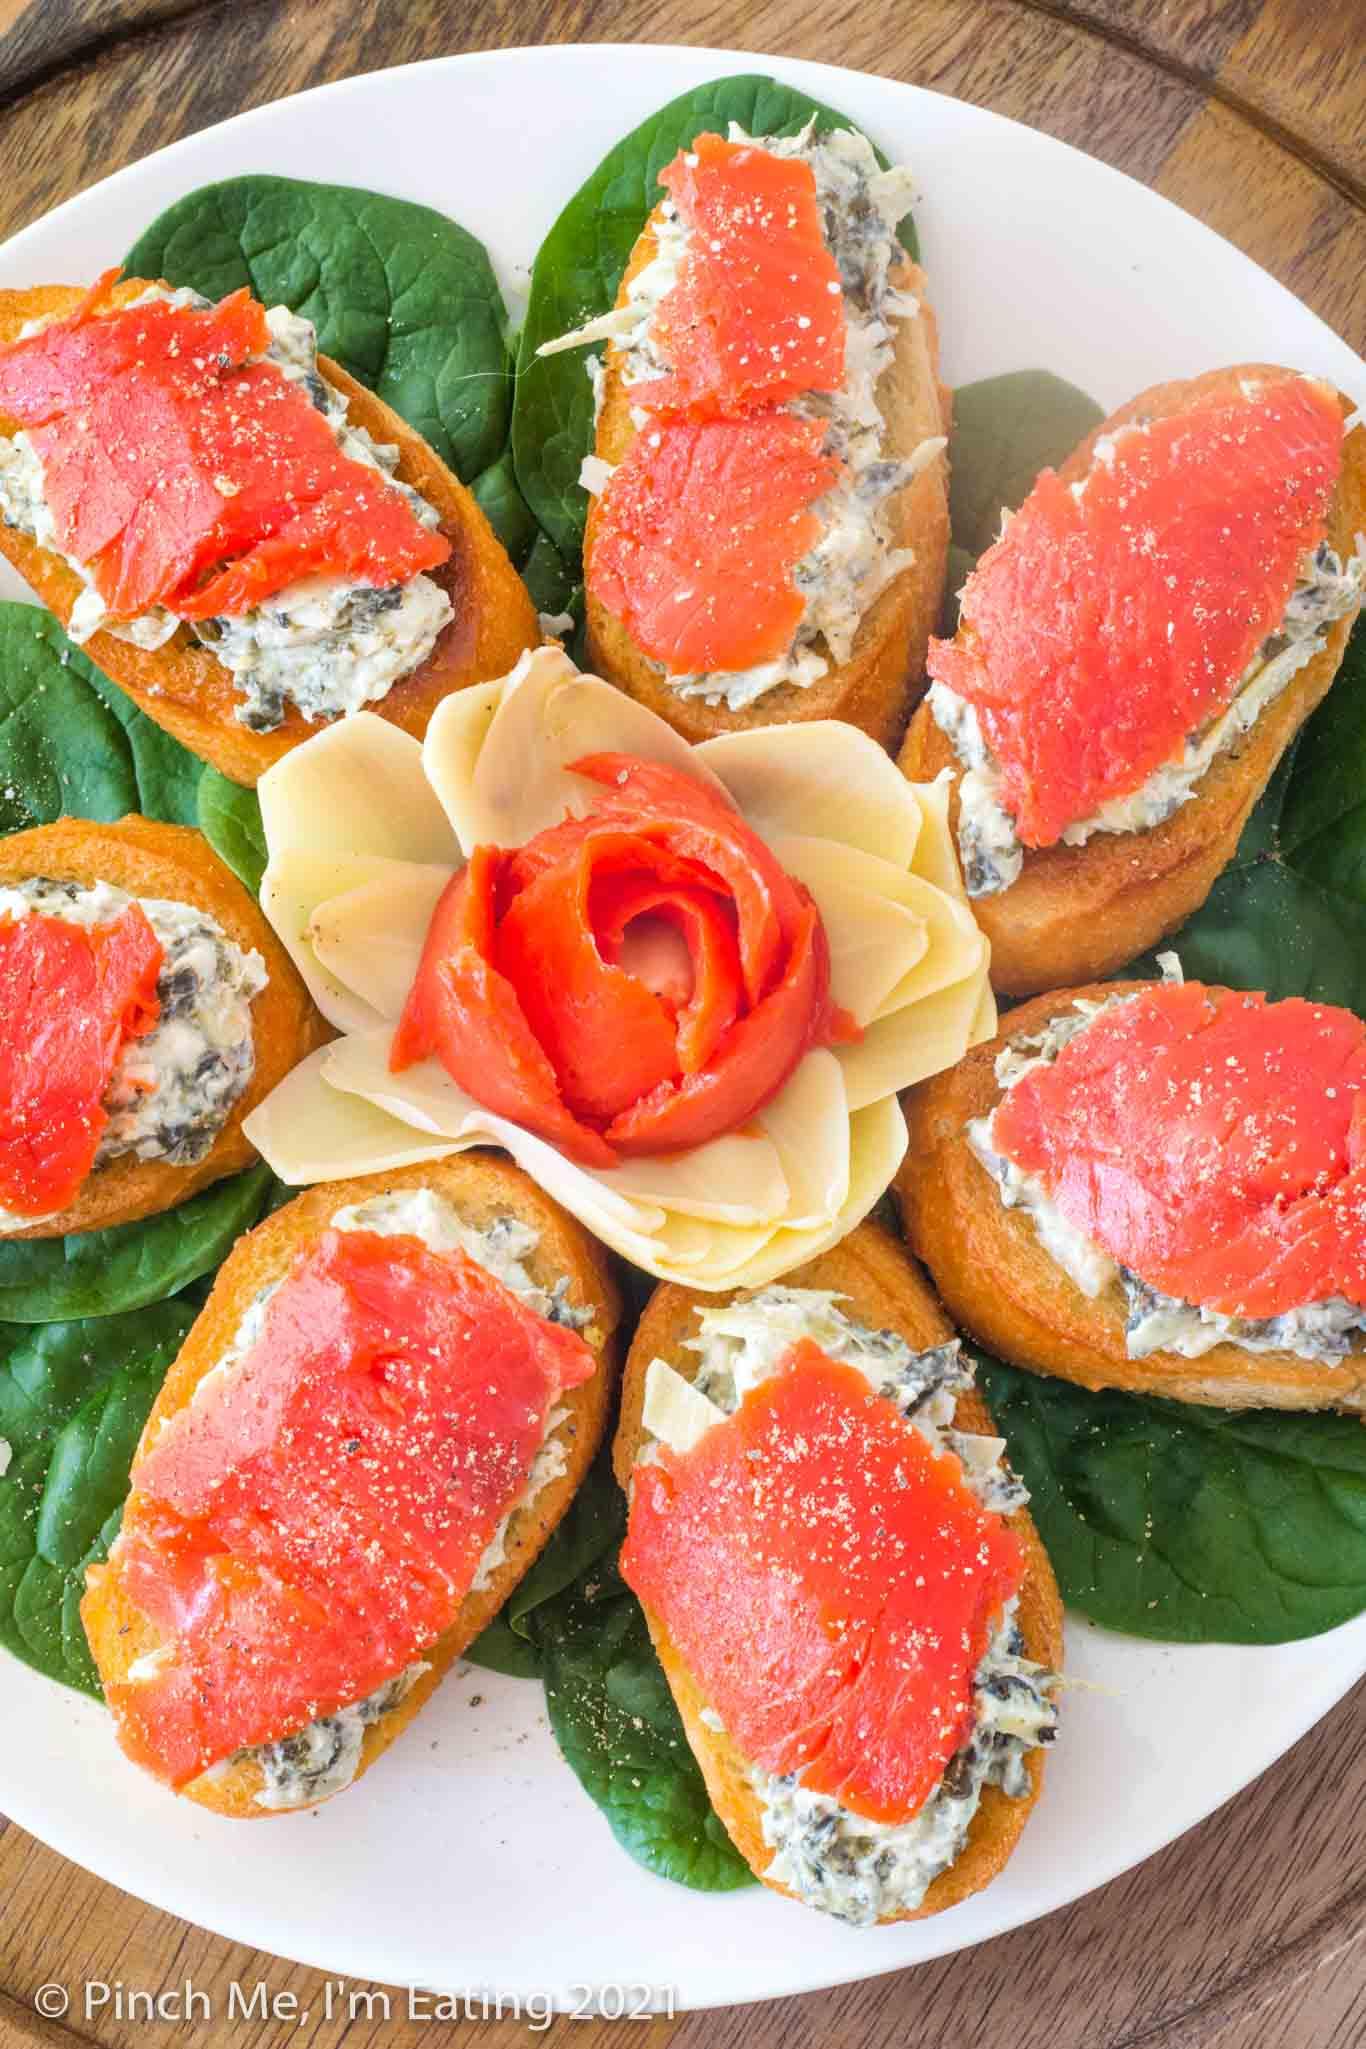 Spinach Artichoke Crostini with Smoked Salmon